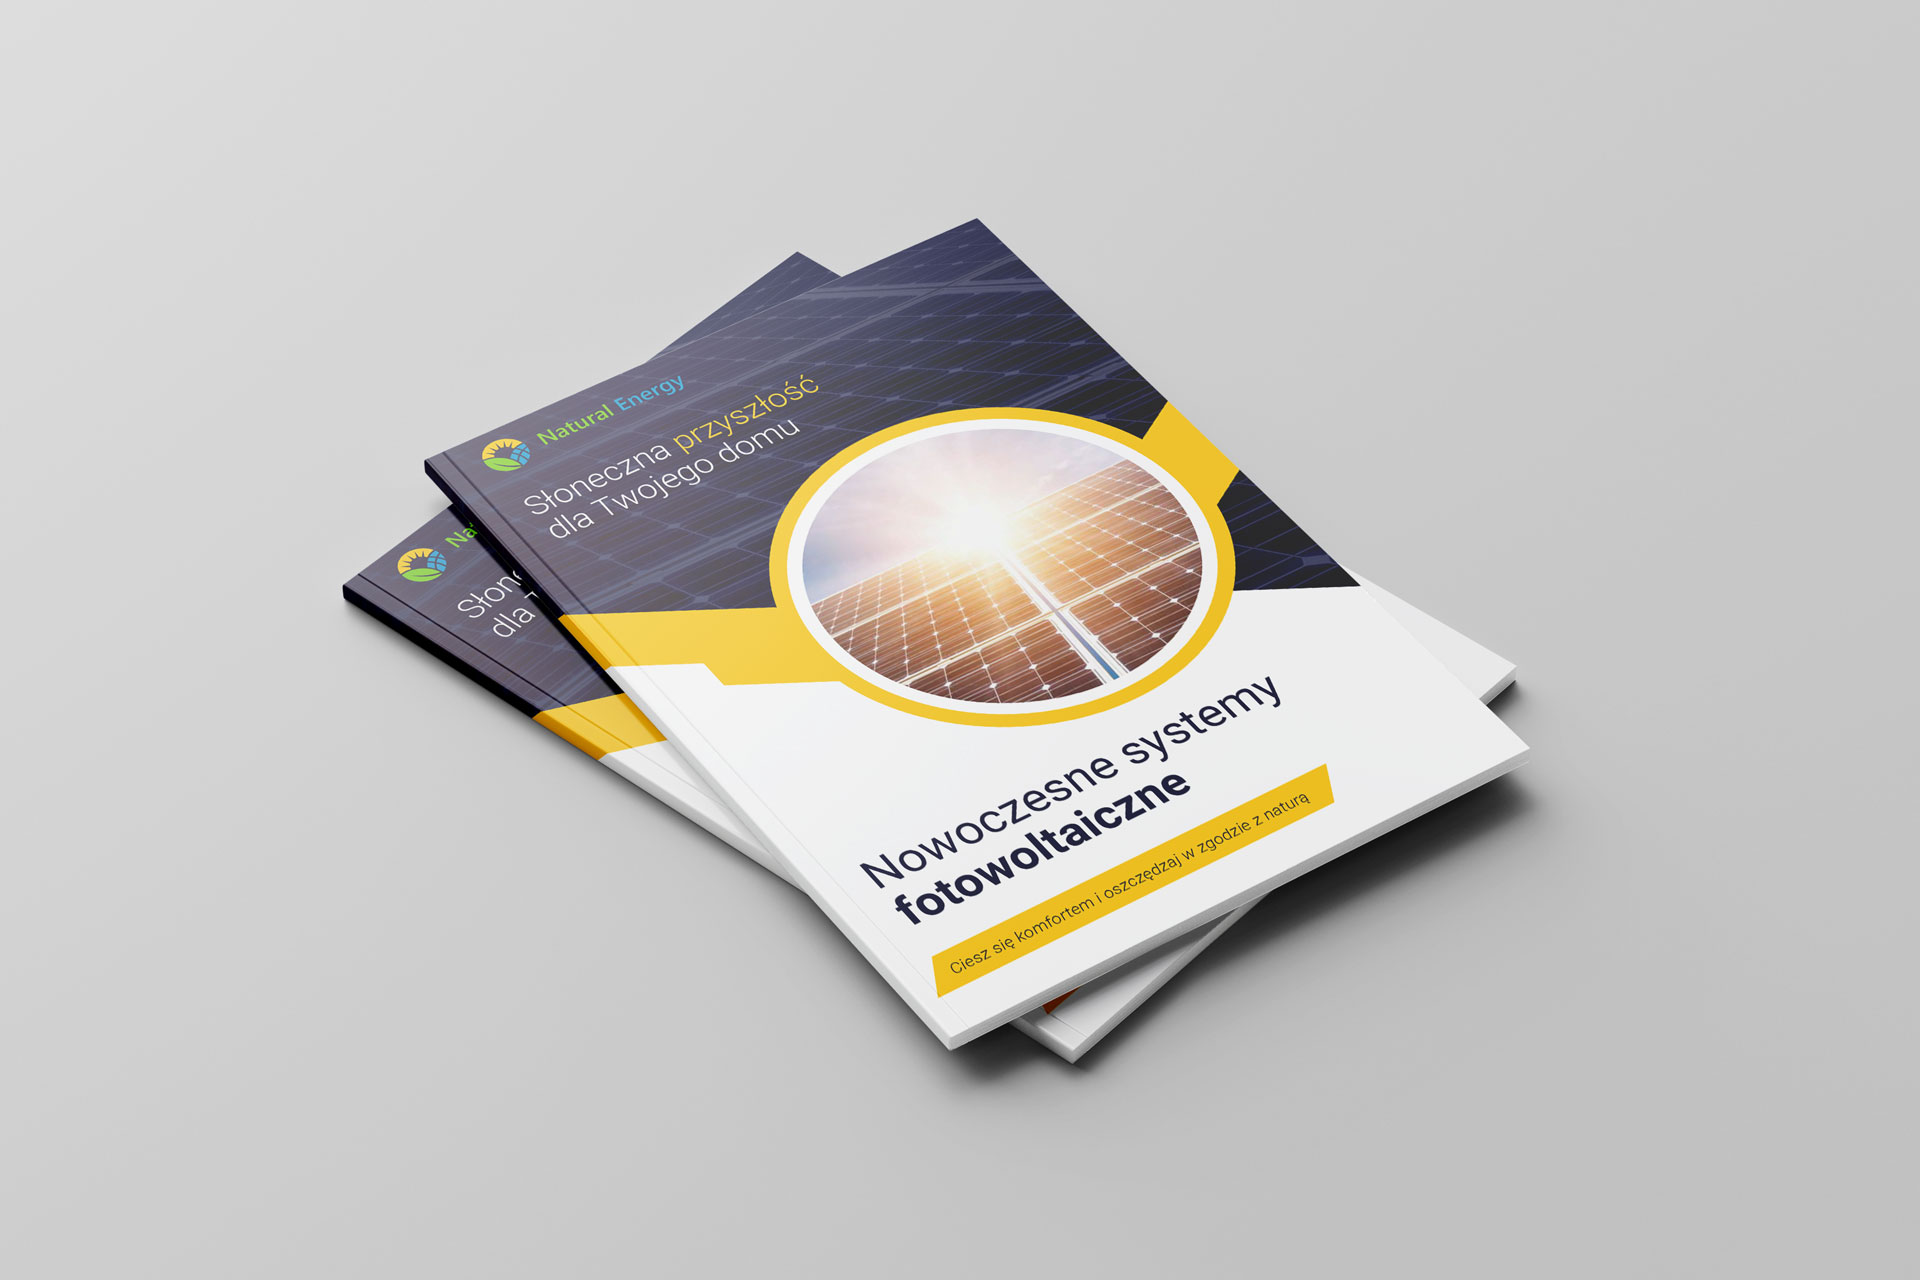 Projektowanie-graficzne-Natural-Energy-Katalogi-reklamowe-3